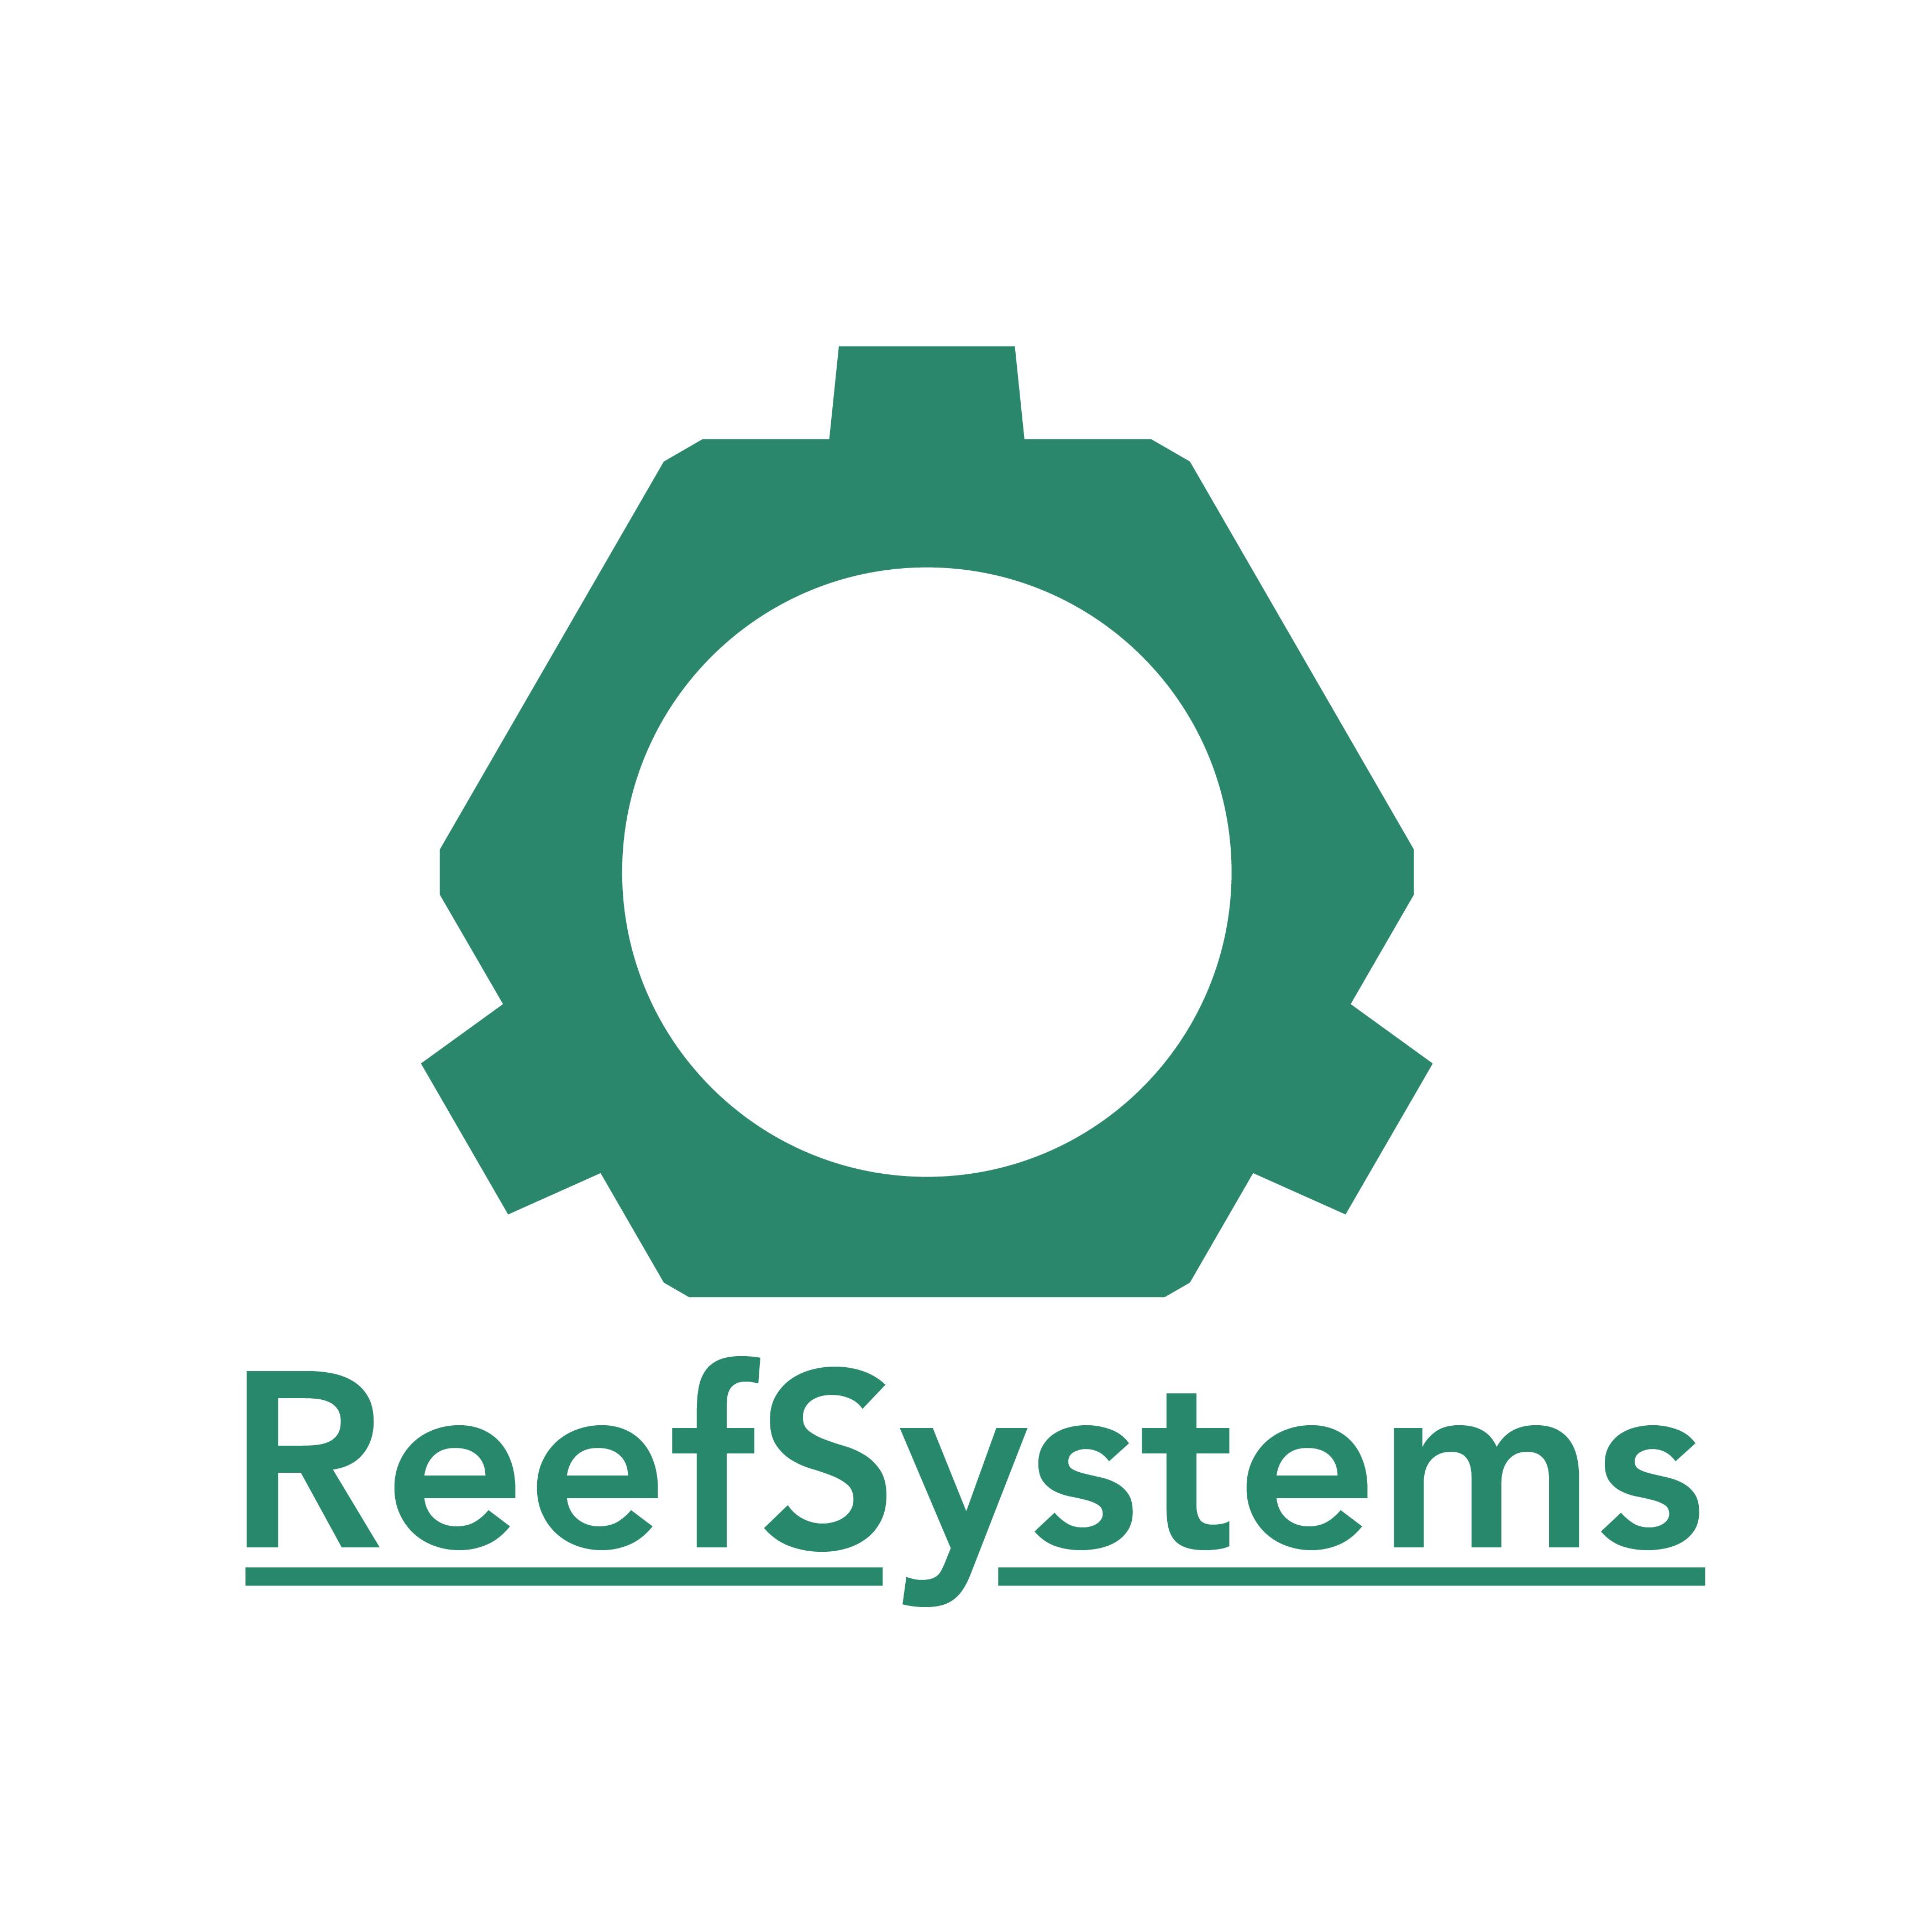 ReefSystems's logo